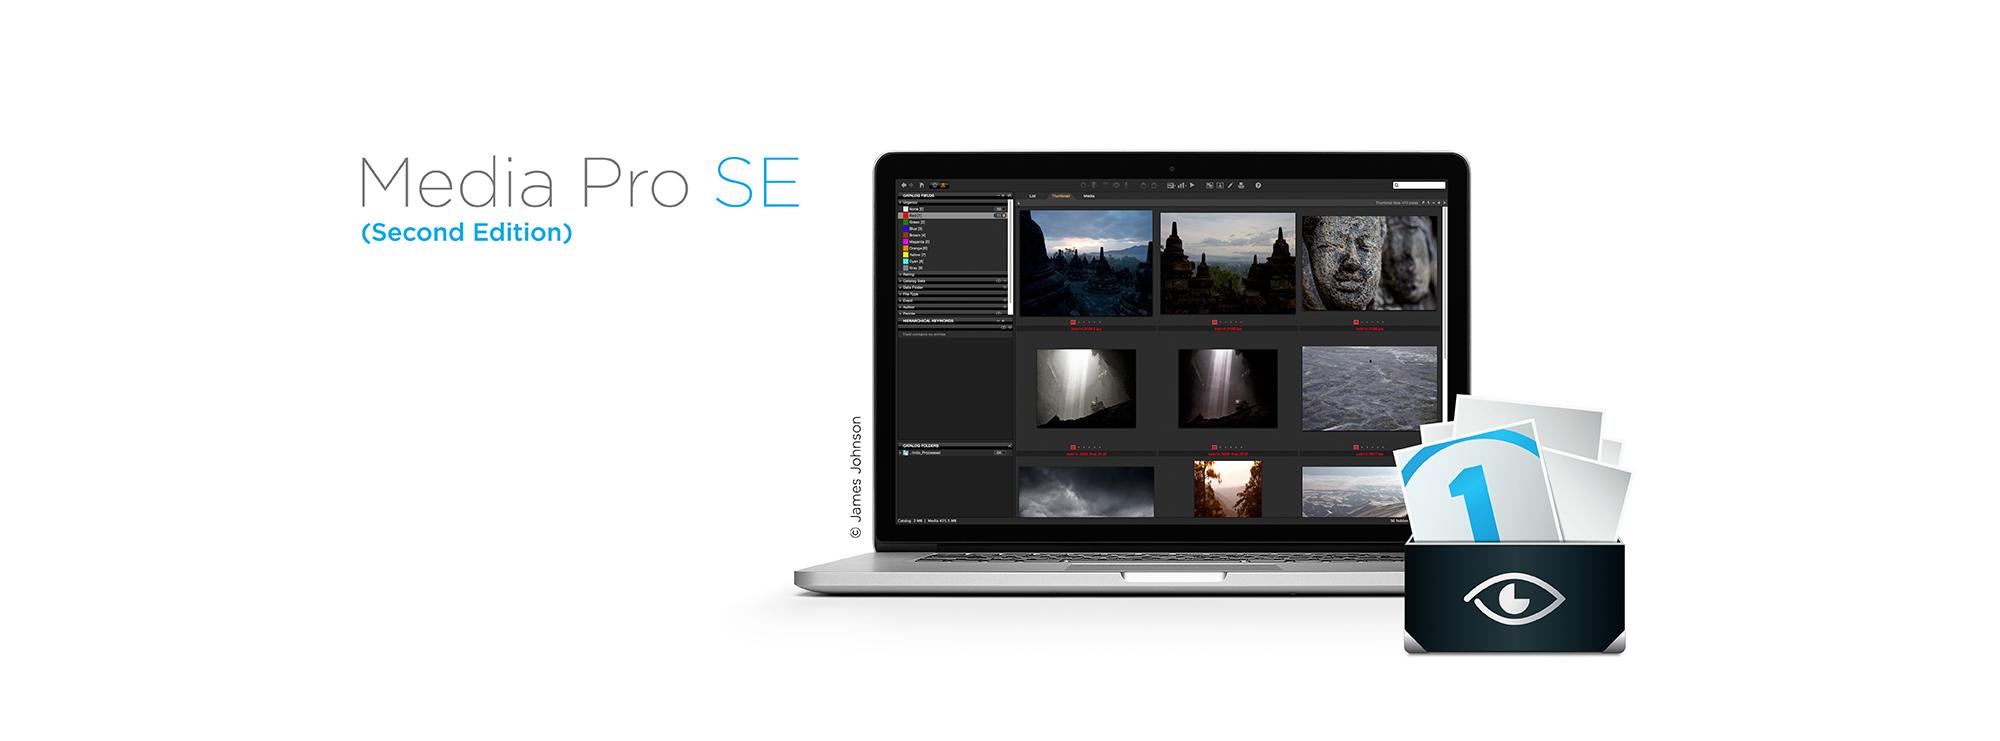 Phase One Media Pro SE 2.2.0.247 نرم افزار ویرایش تصاویر RAW